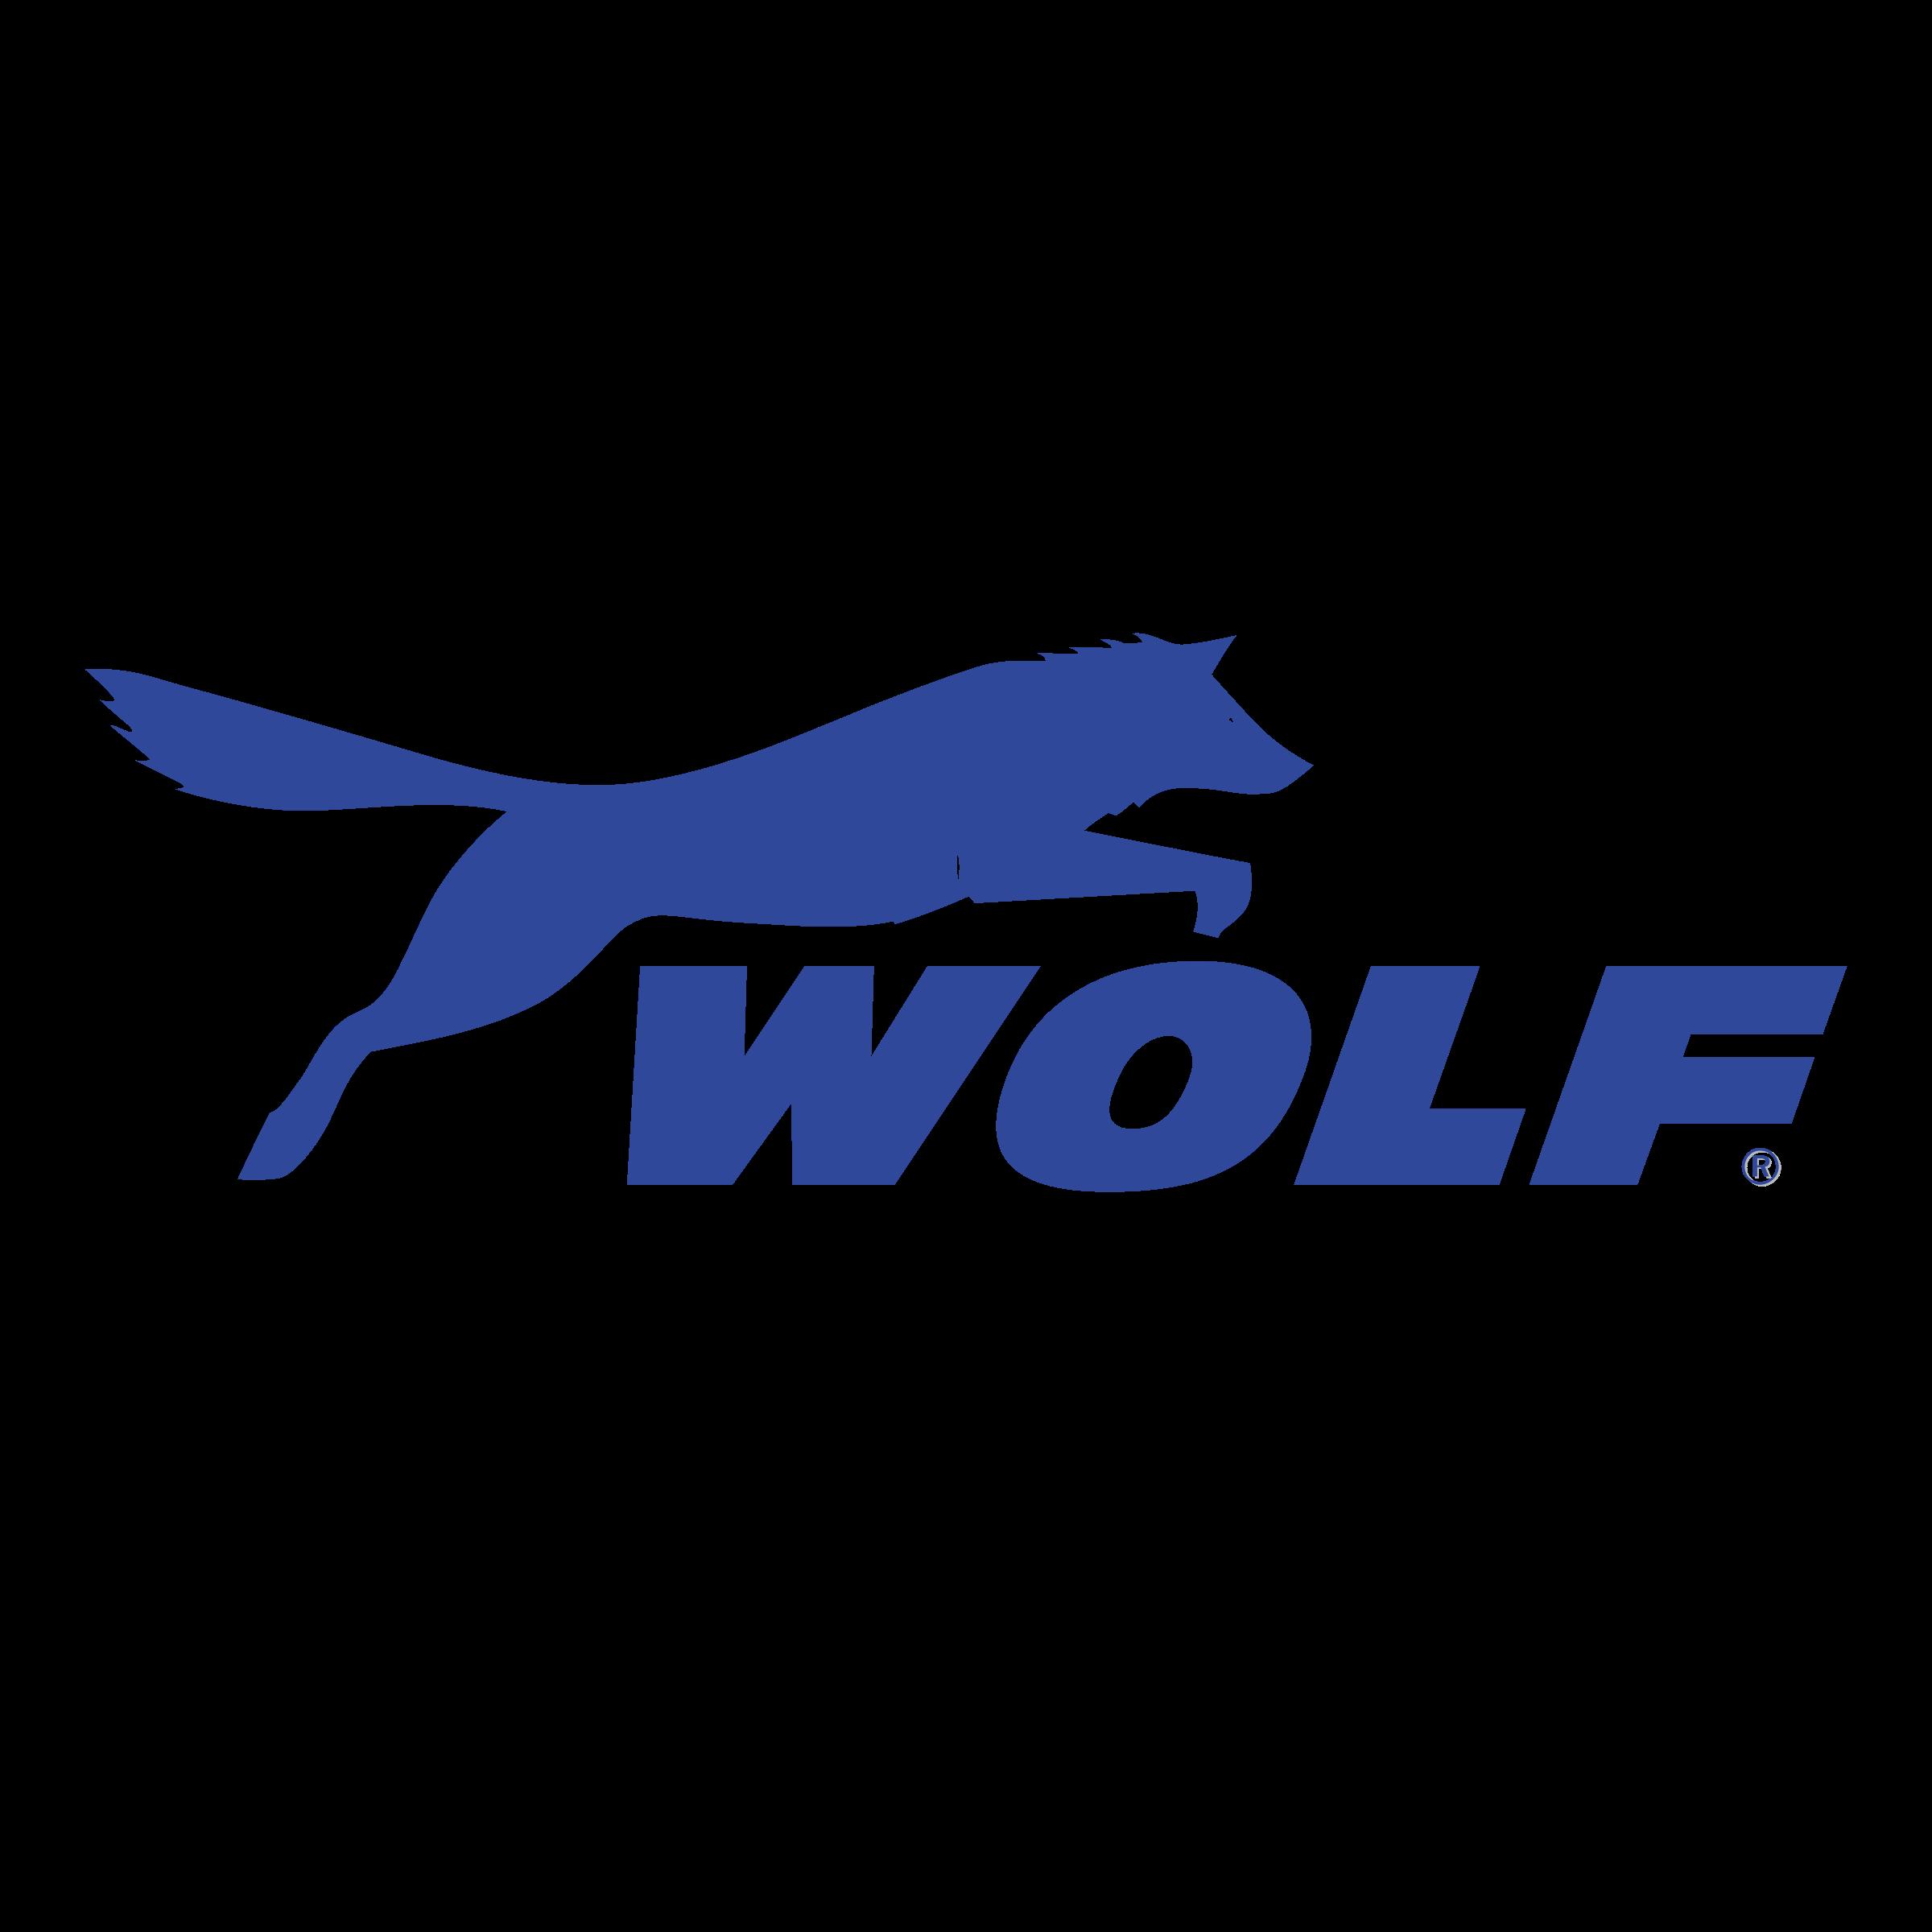 Wolf Logo PNG Transparent & SVG Vector - Freebie Supply